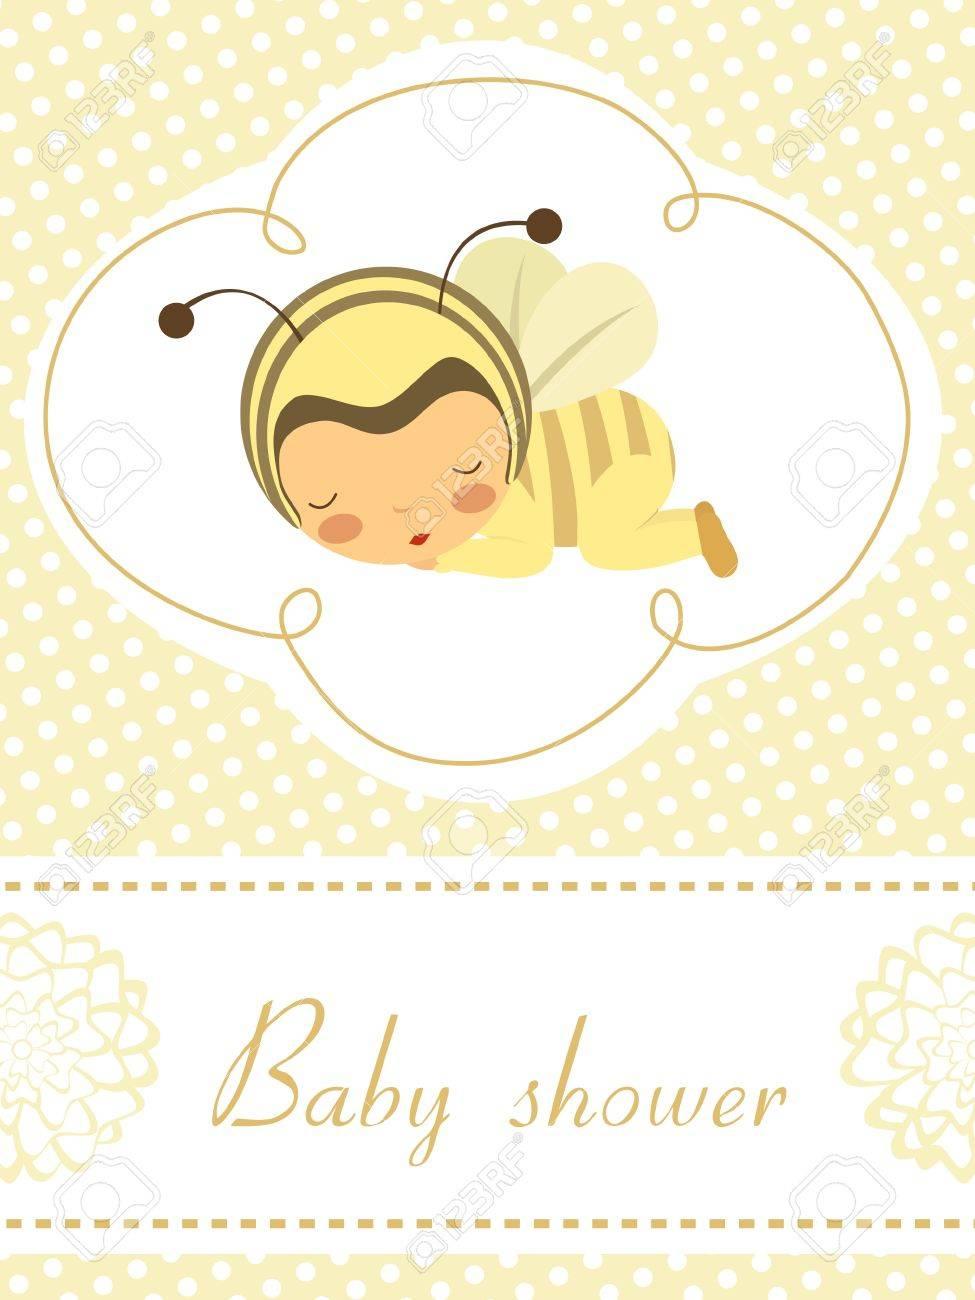 Elegant Baby announcement card with sleeping baby girl in bee costume Stock Vector - 16727981